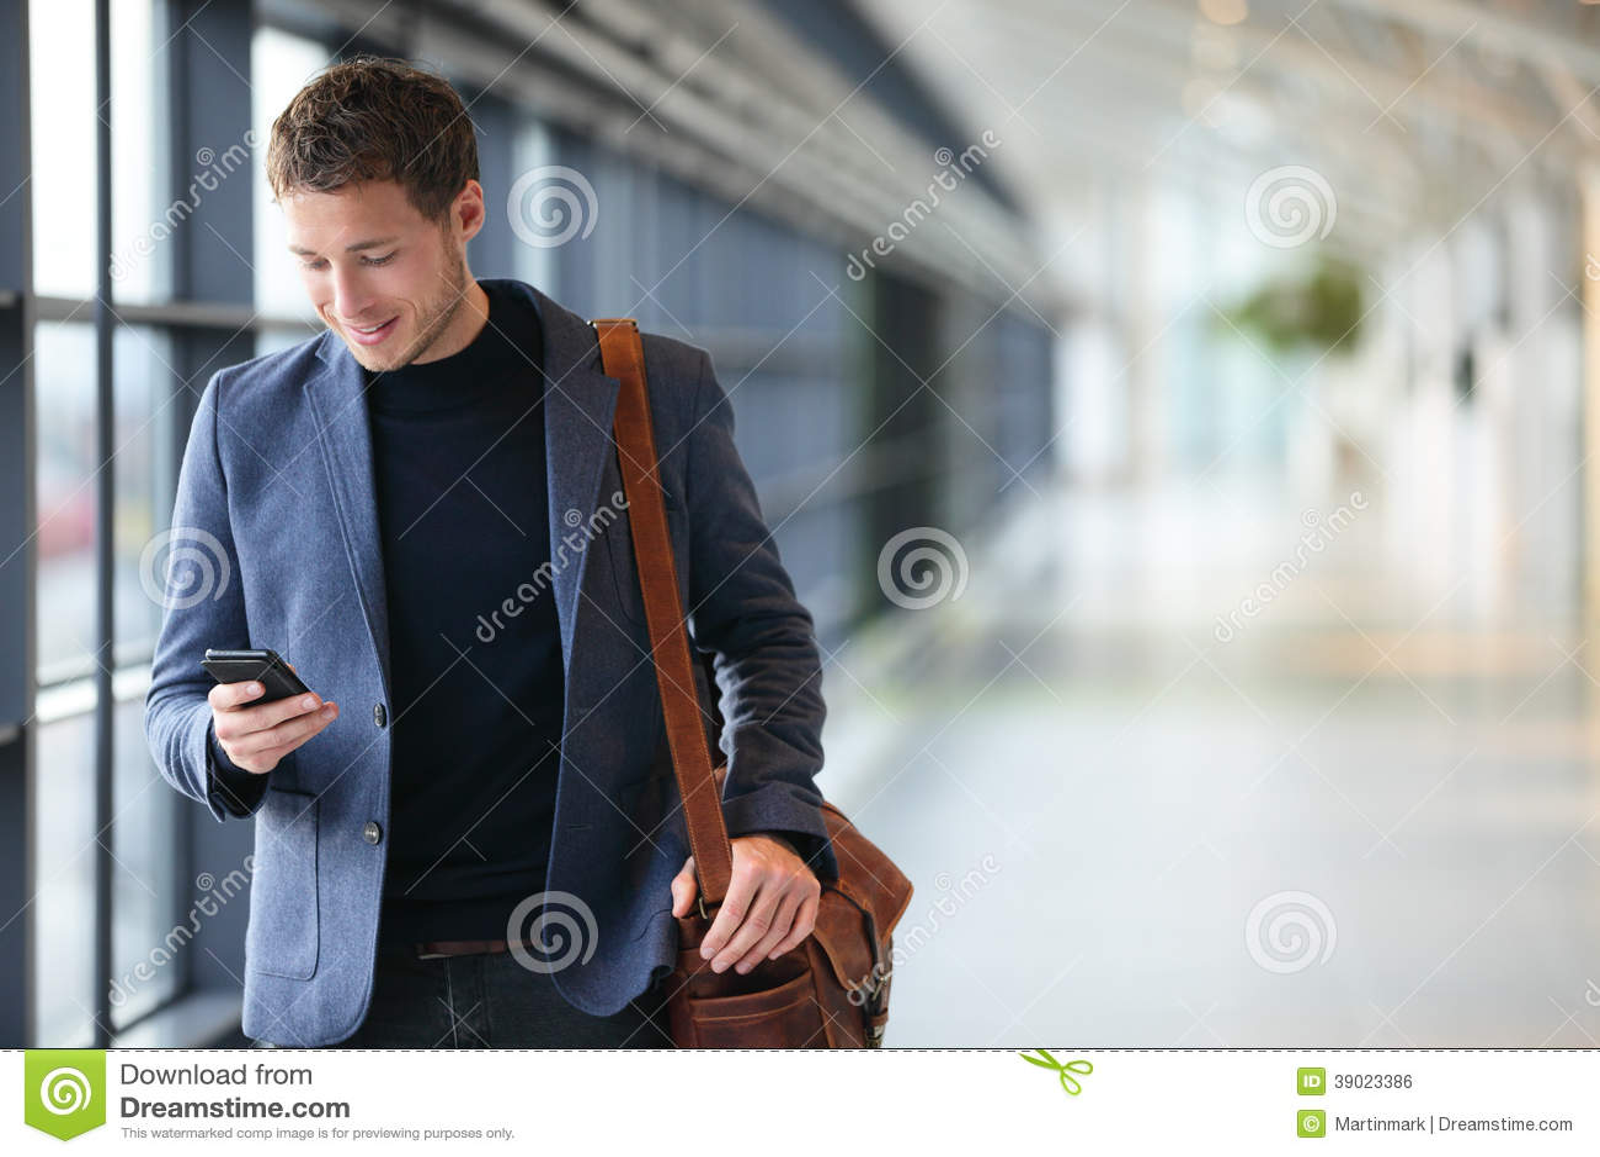 Mann am intelligenten Telefon - junger Geschäftsmann im Flughafen